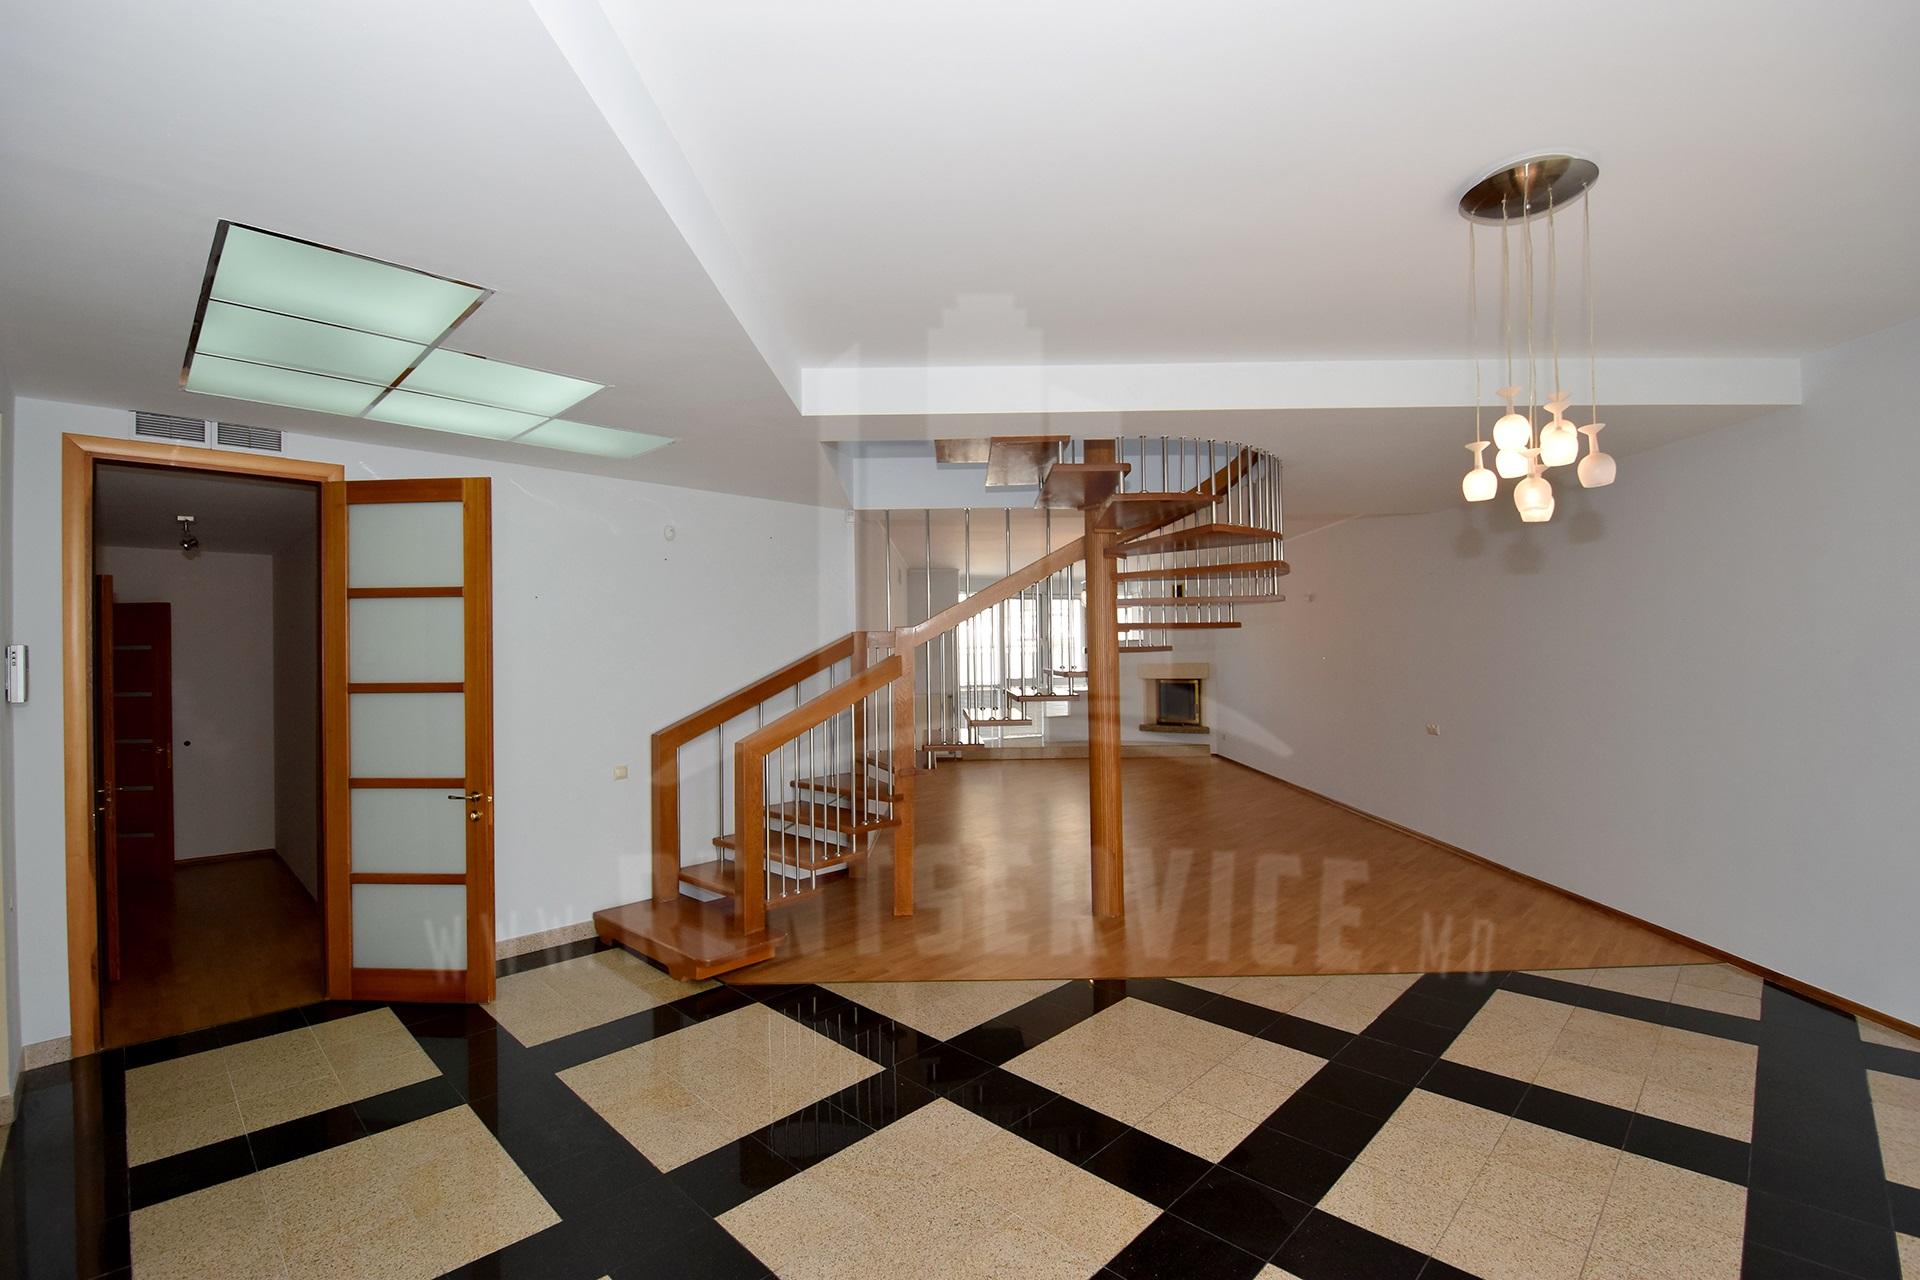 269_apartment_3.jpg